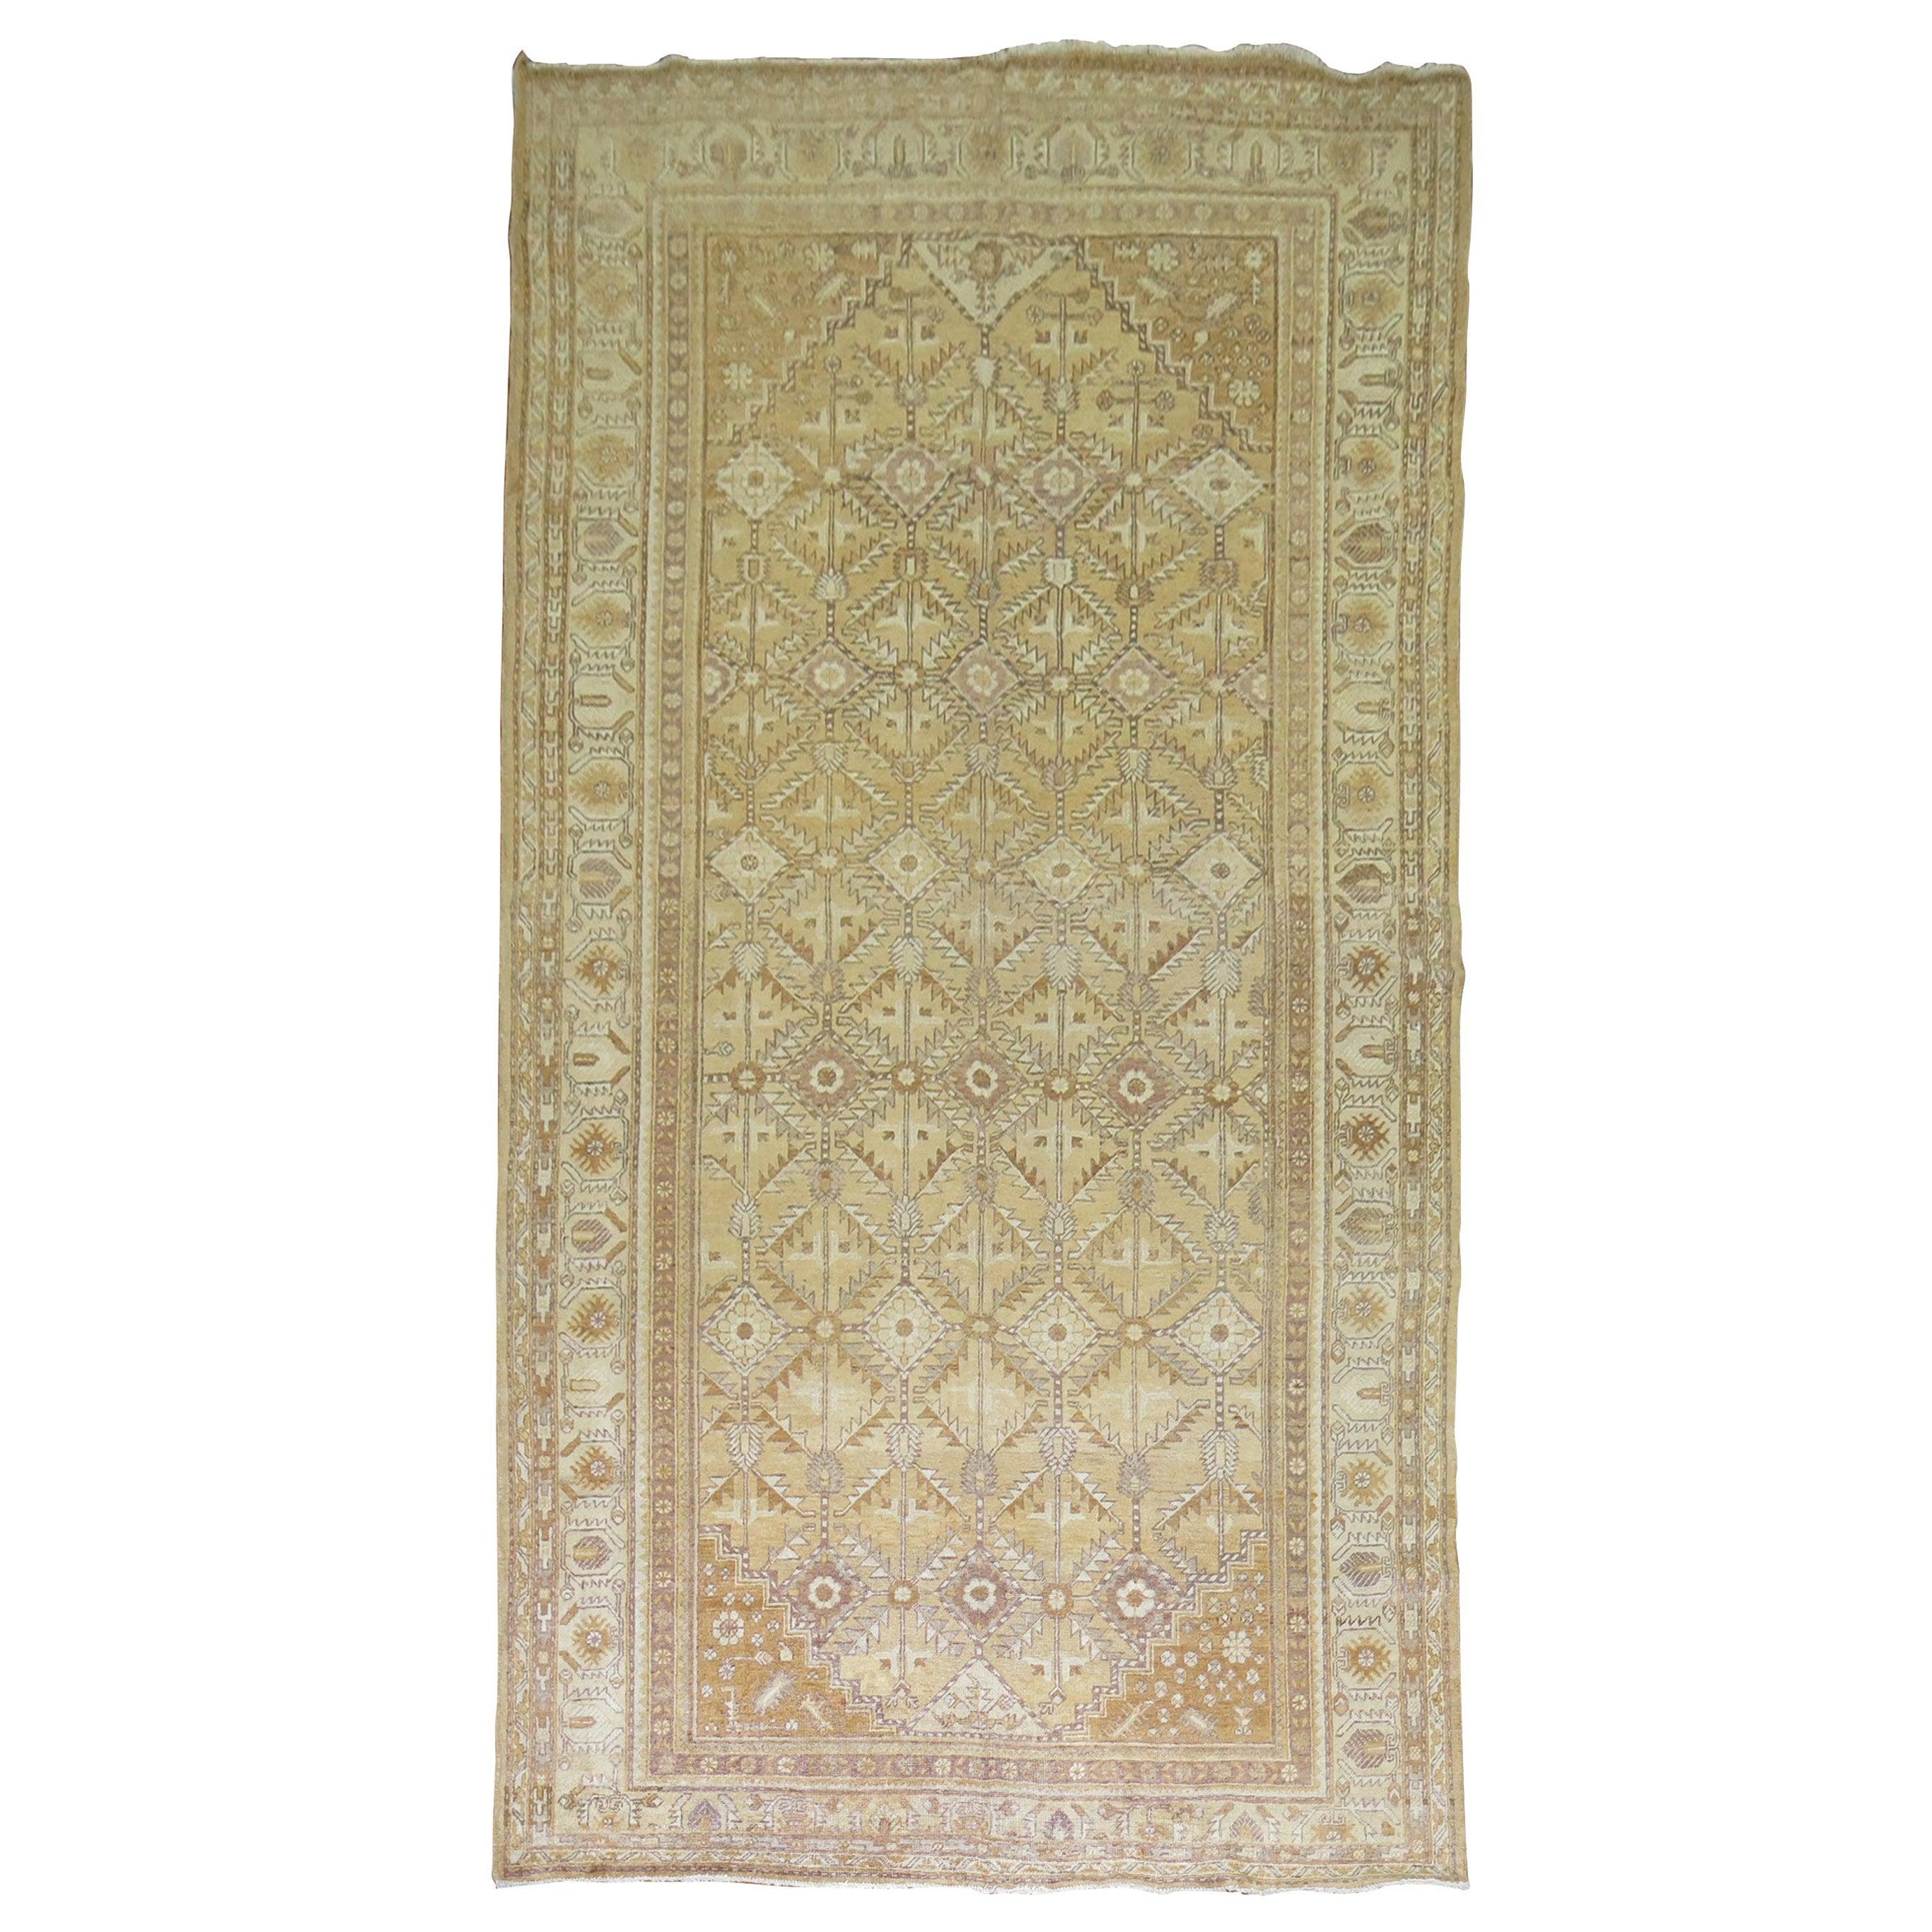 Straw Antique Khotan Rug, Early 20th Century